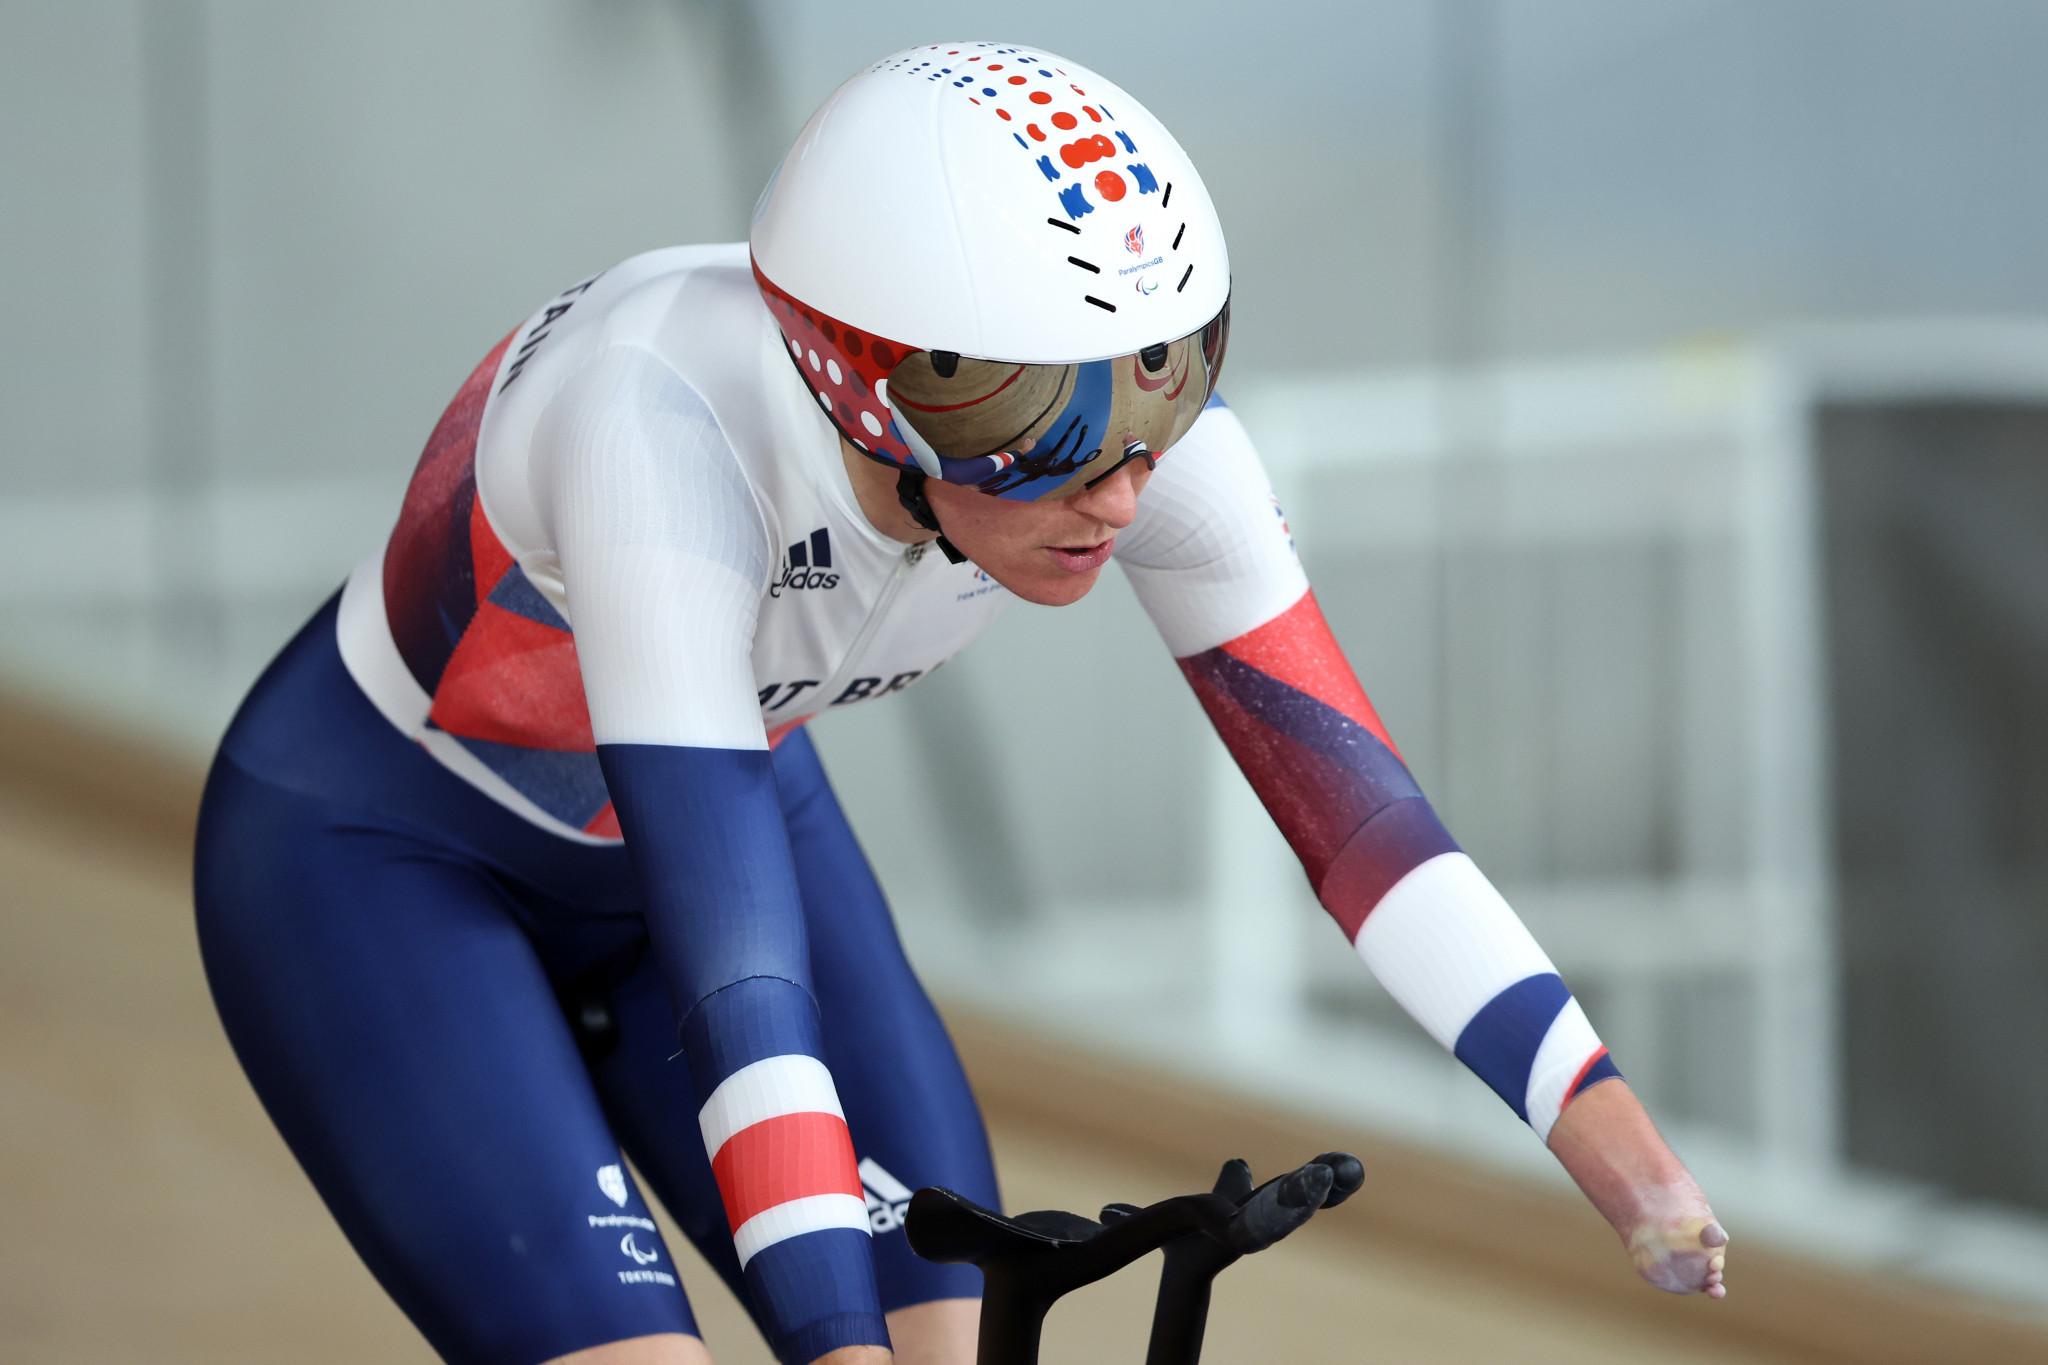 Storey aiming for British gold record as Tokyo 2020 road cycling set to begin